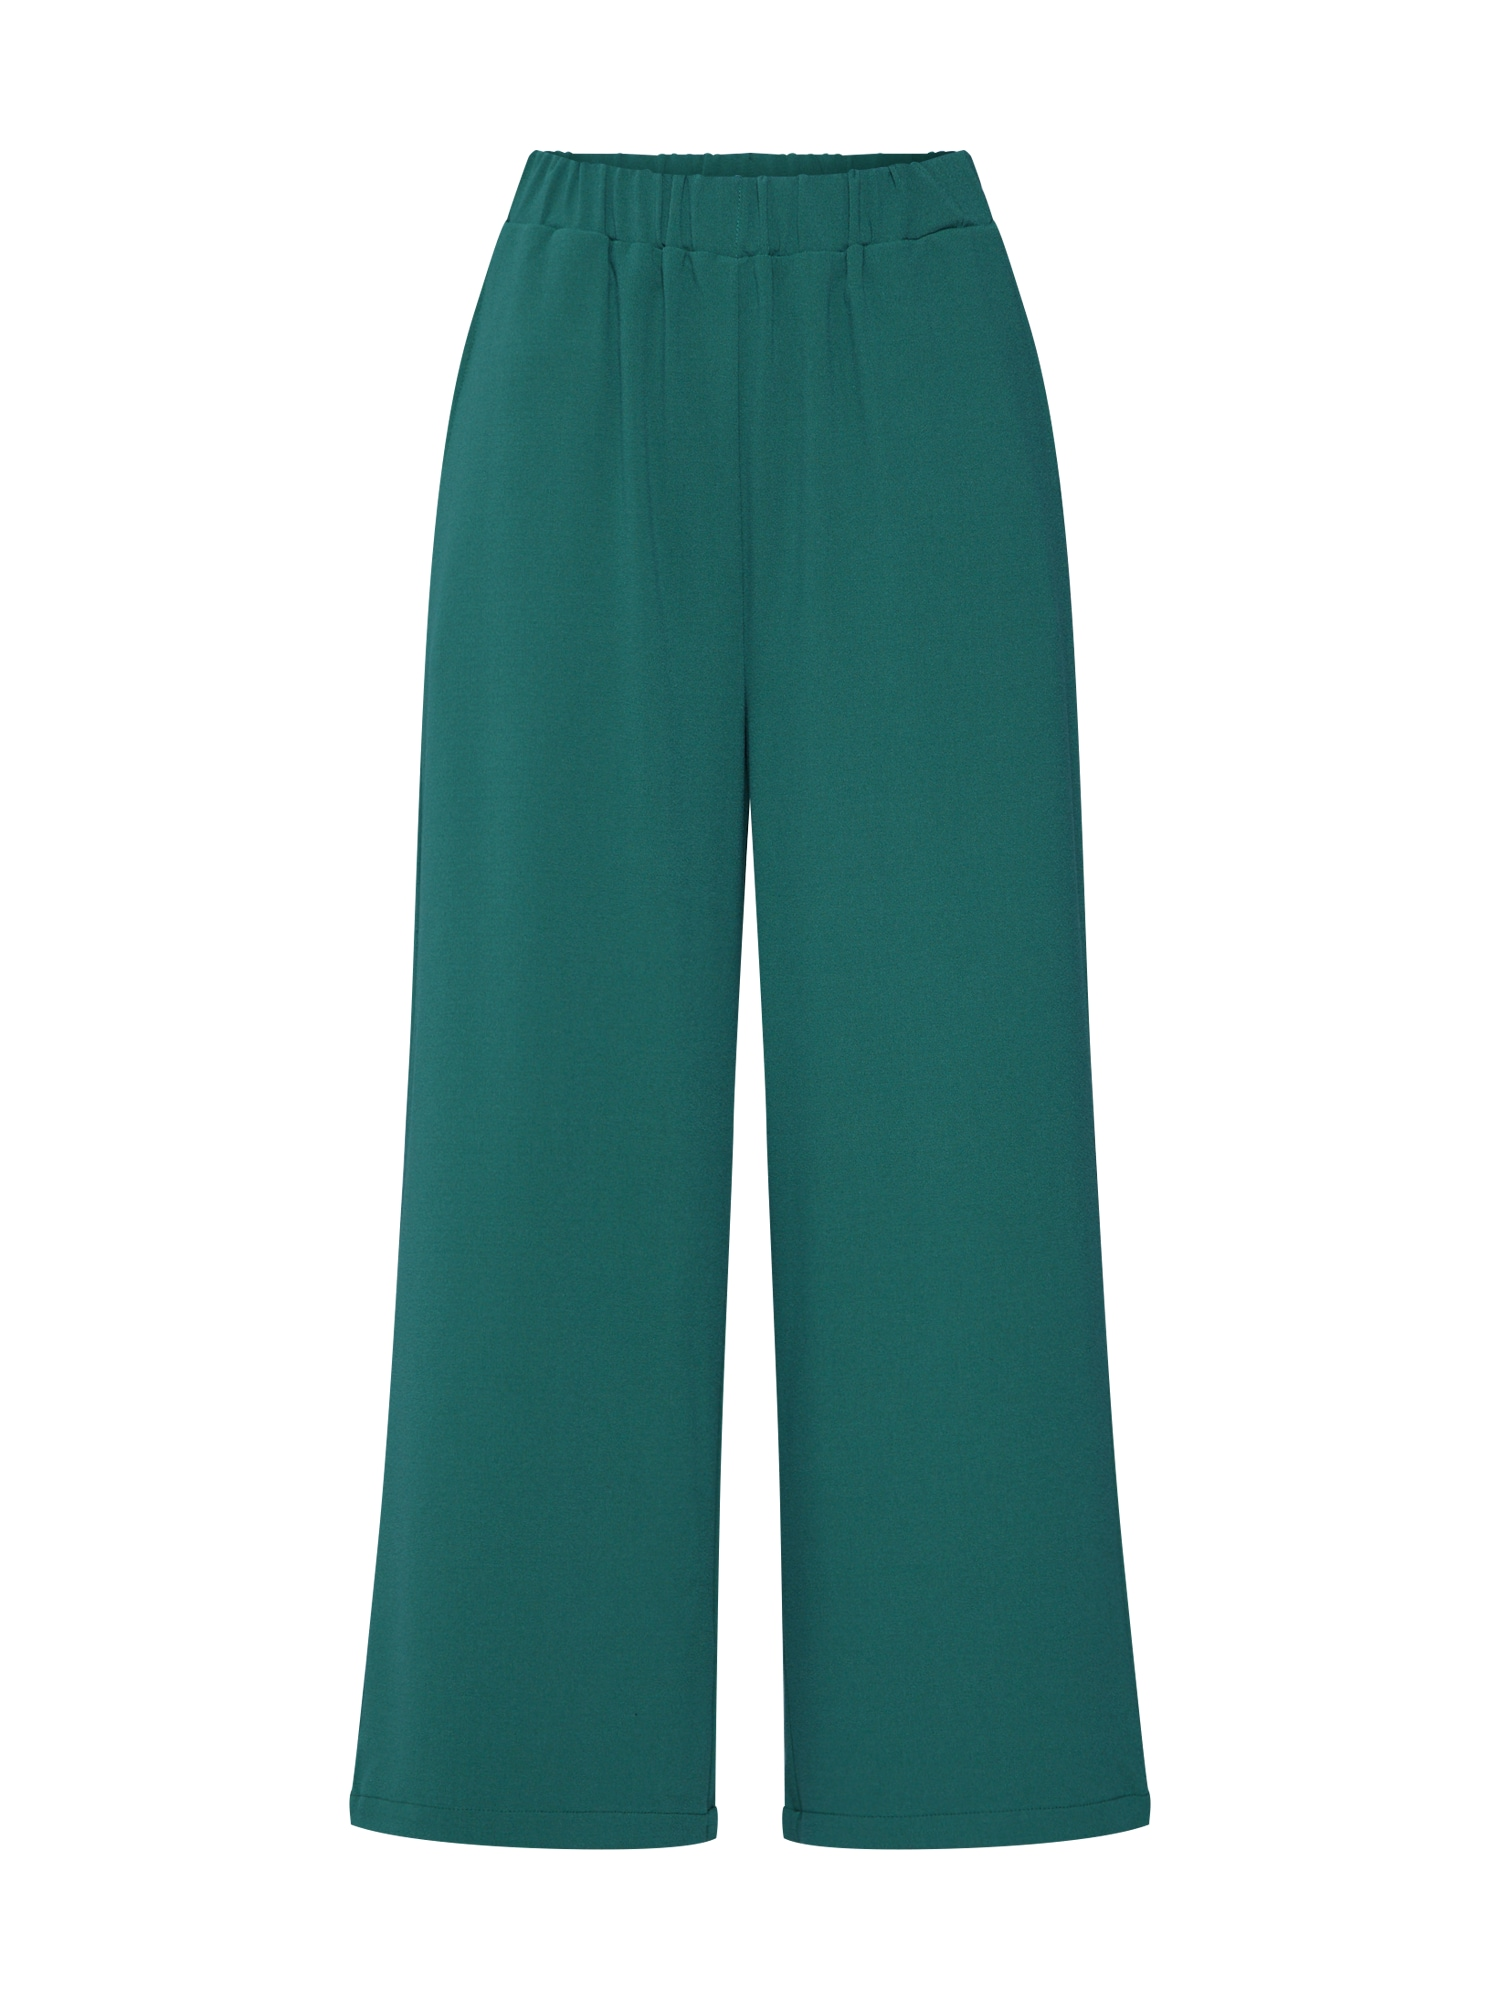 Dr. Denim Kelnės 'Able Trousers' žalia